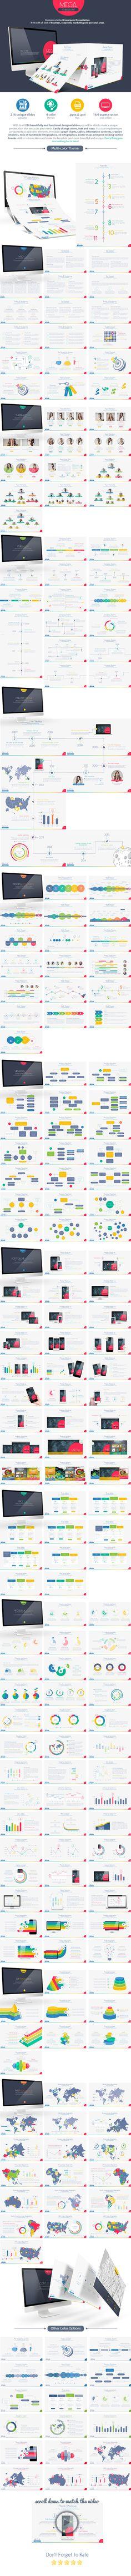 Mega Powerpoint Presentation (PowerPoint Templates)